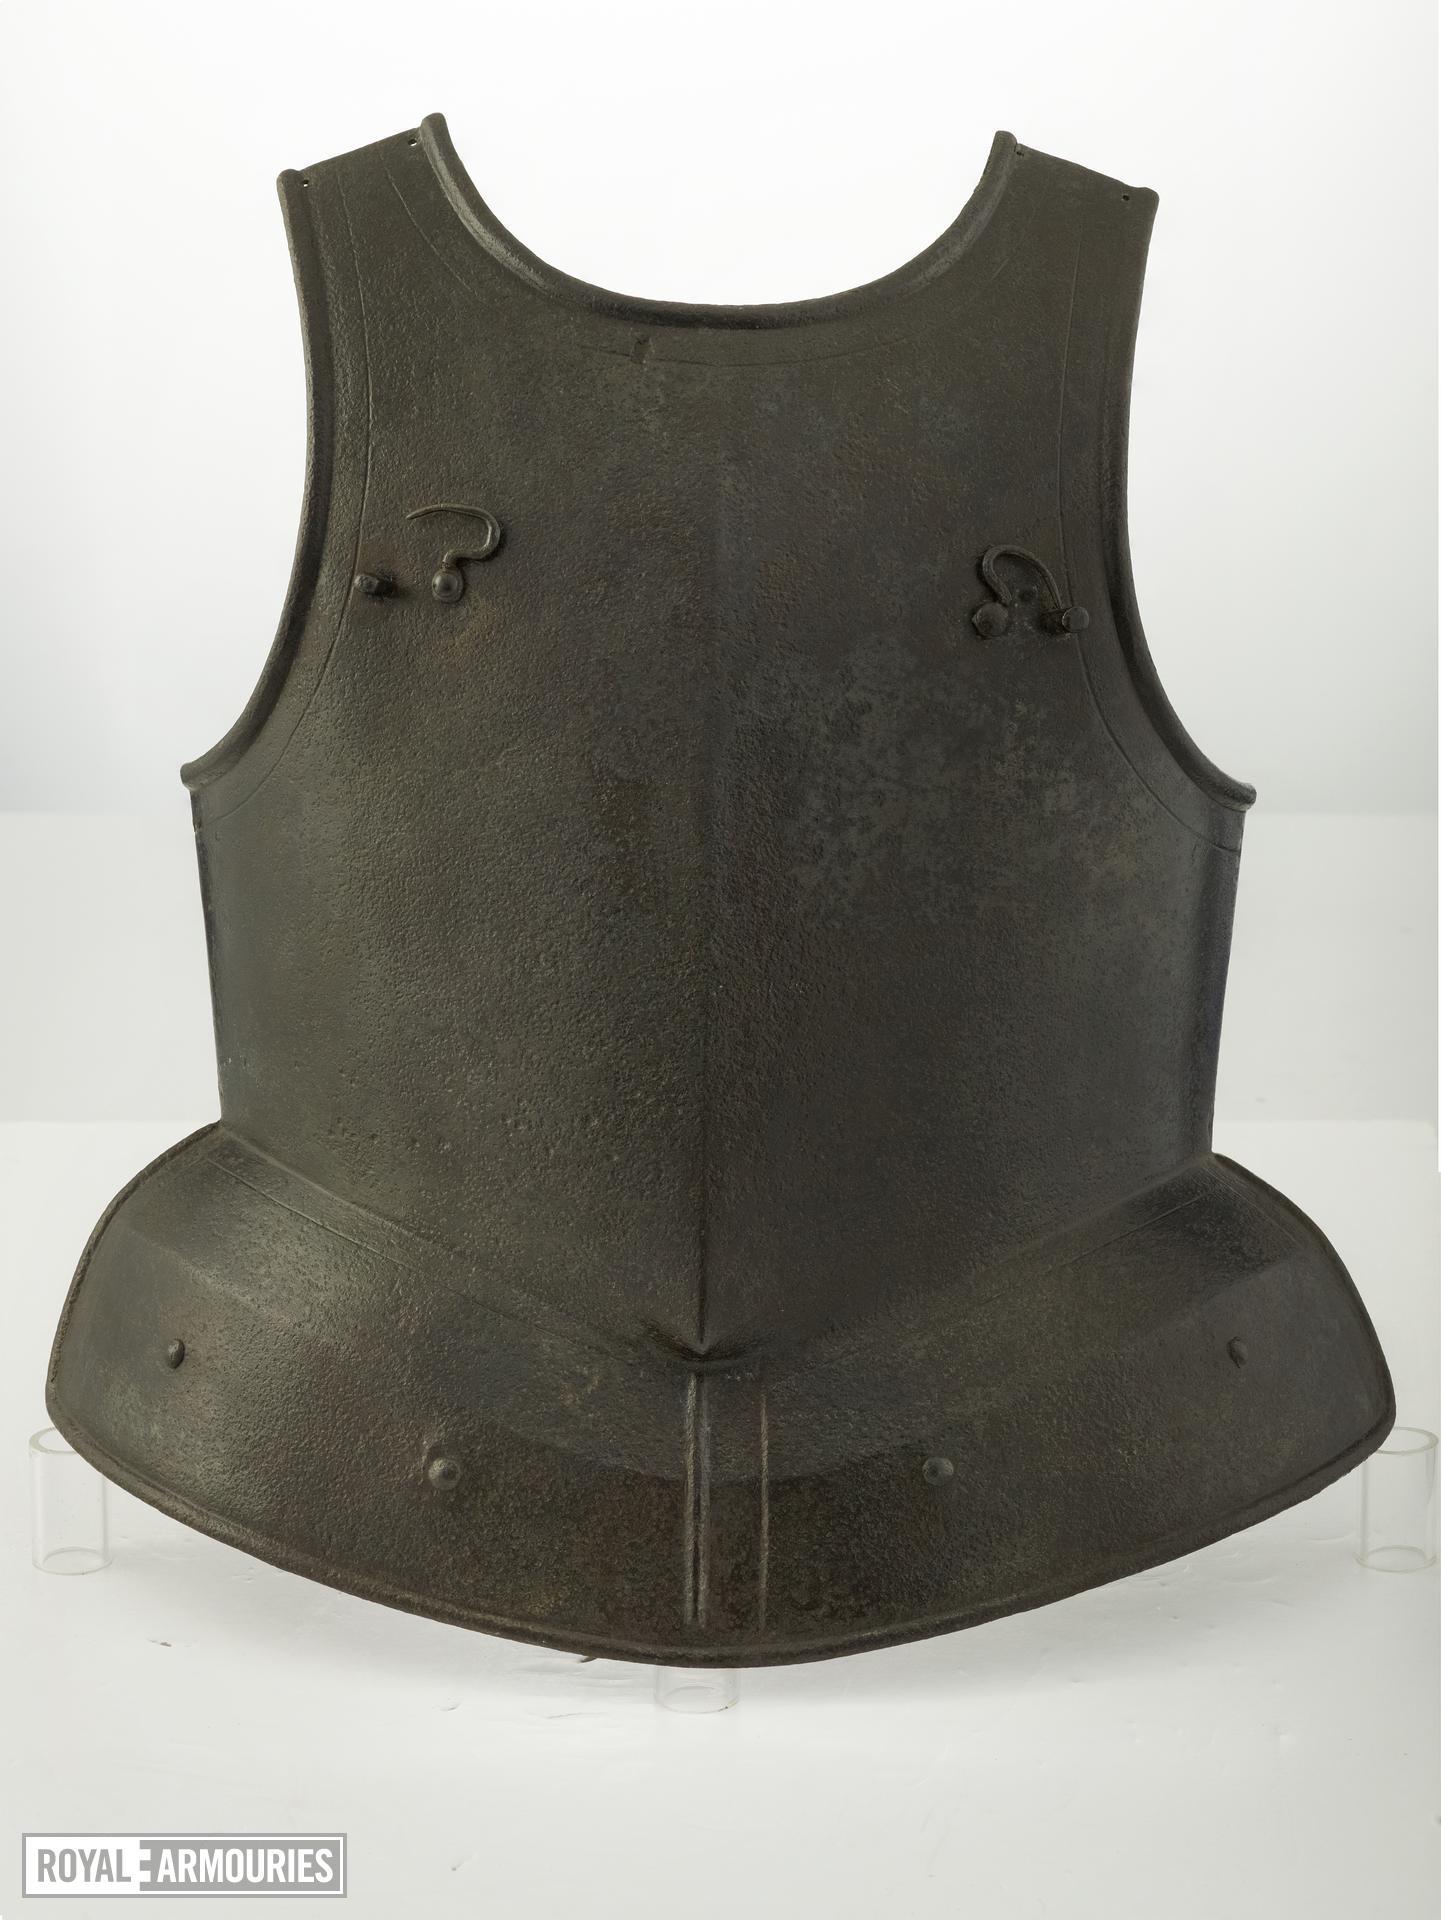 Pikeman's breastplate